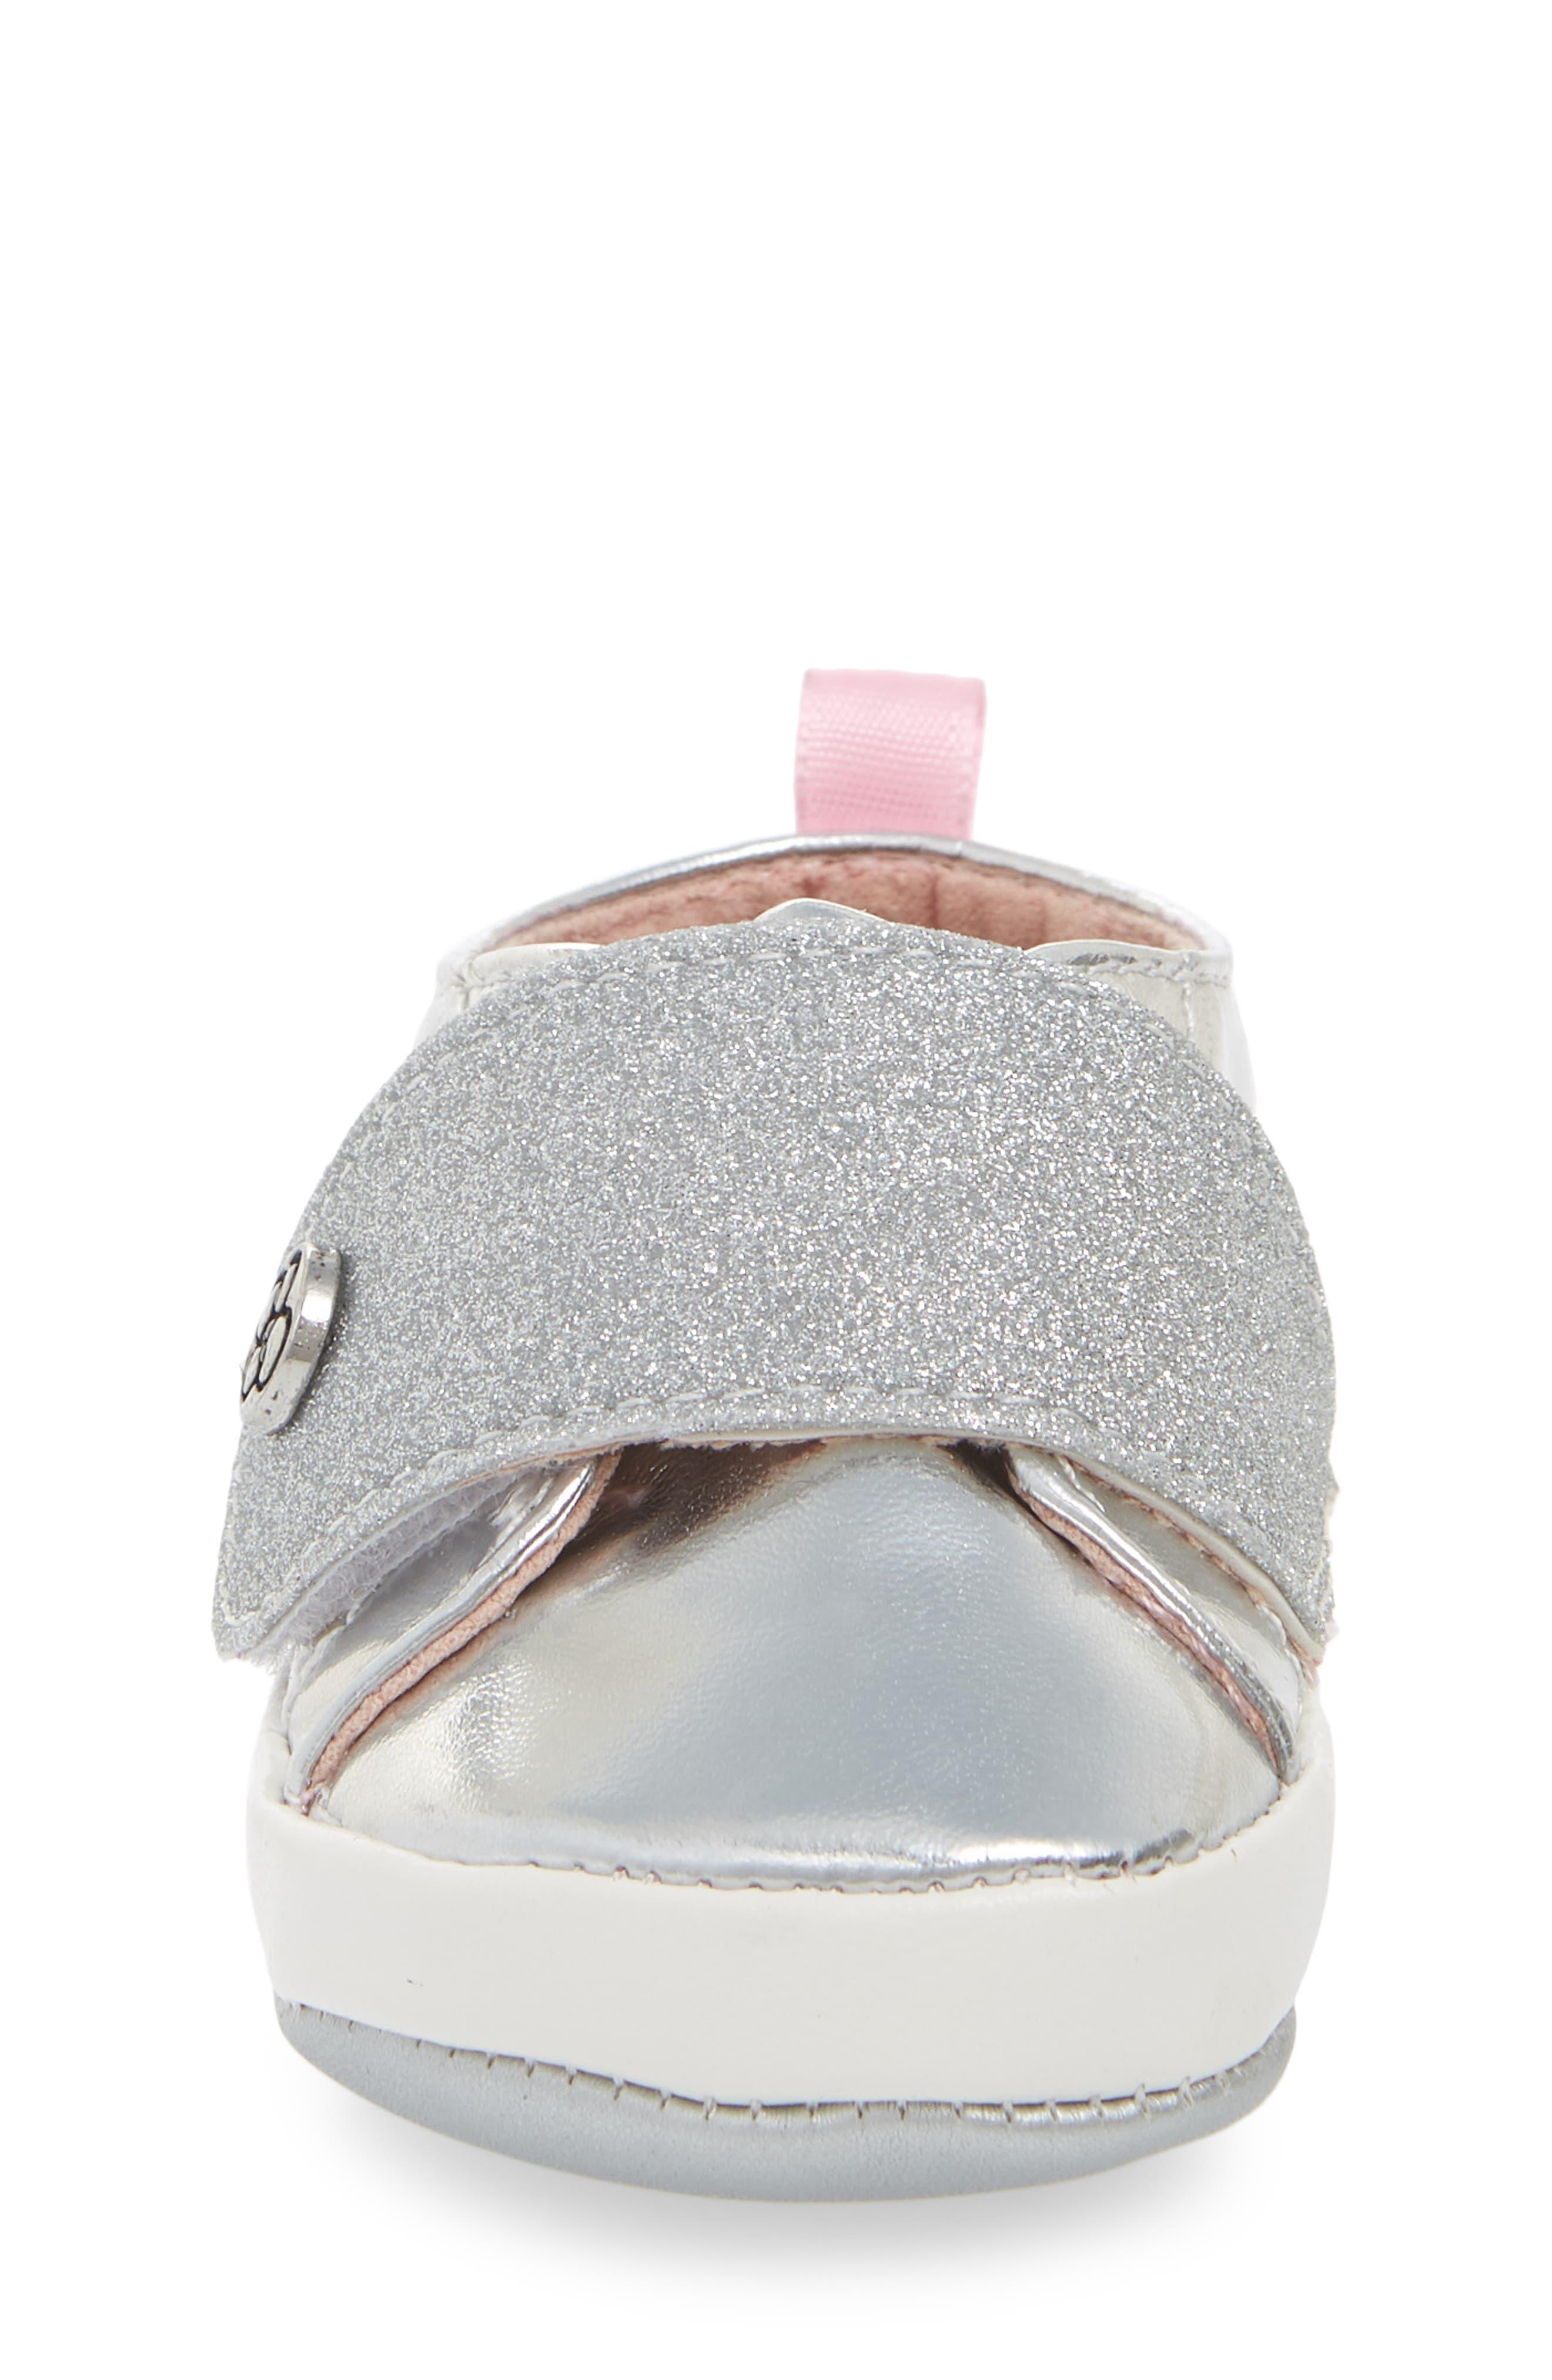 JESSICA SIMPSON,                             Glitter Crib Sneaker,                             Alternate thumbnail 4, color,                             040